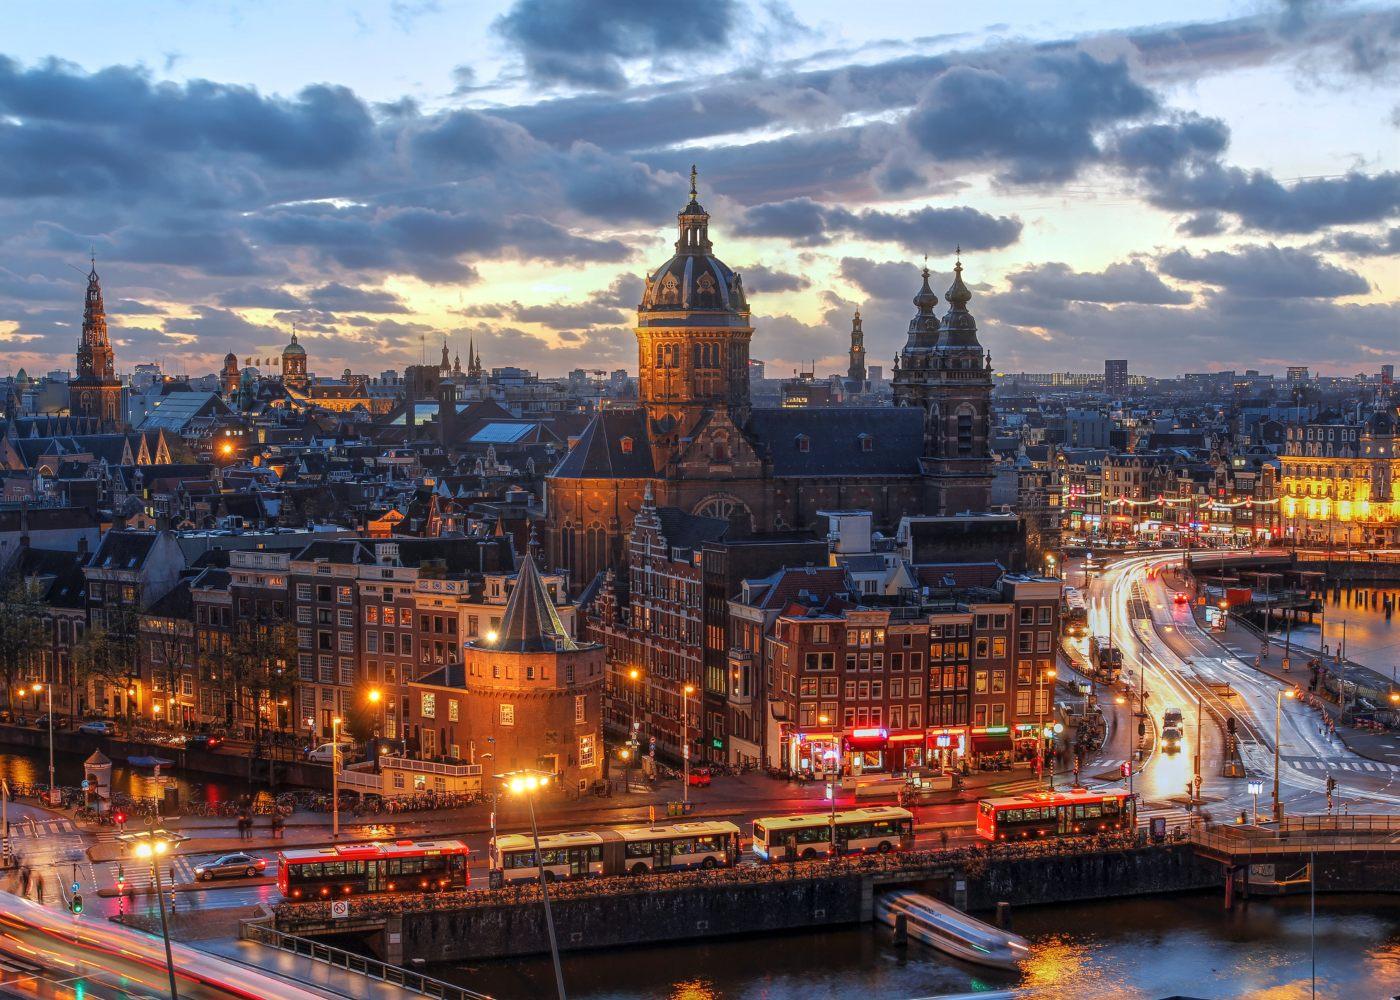 Panorâmica nocturna de Amesterdão